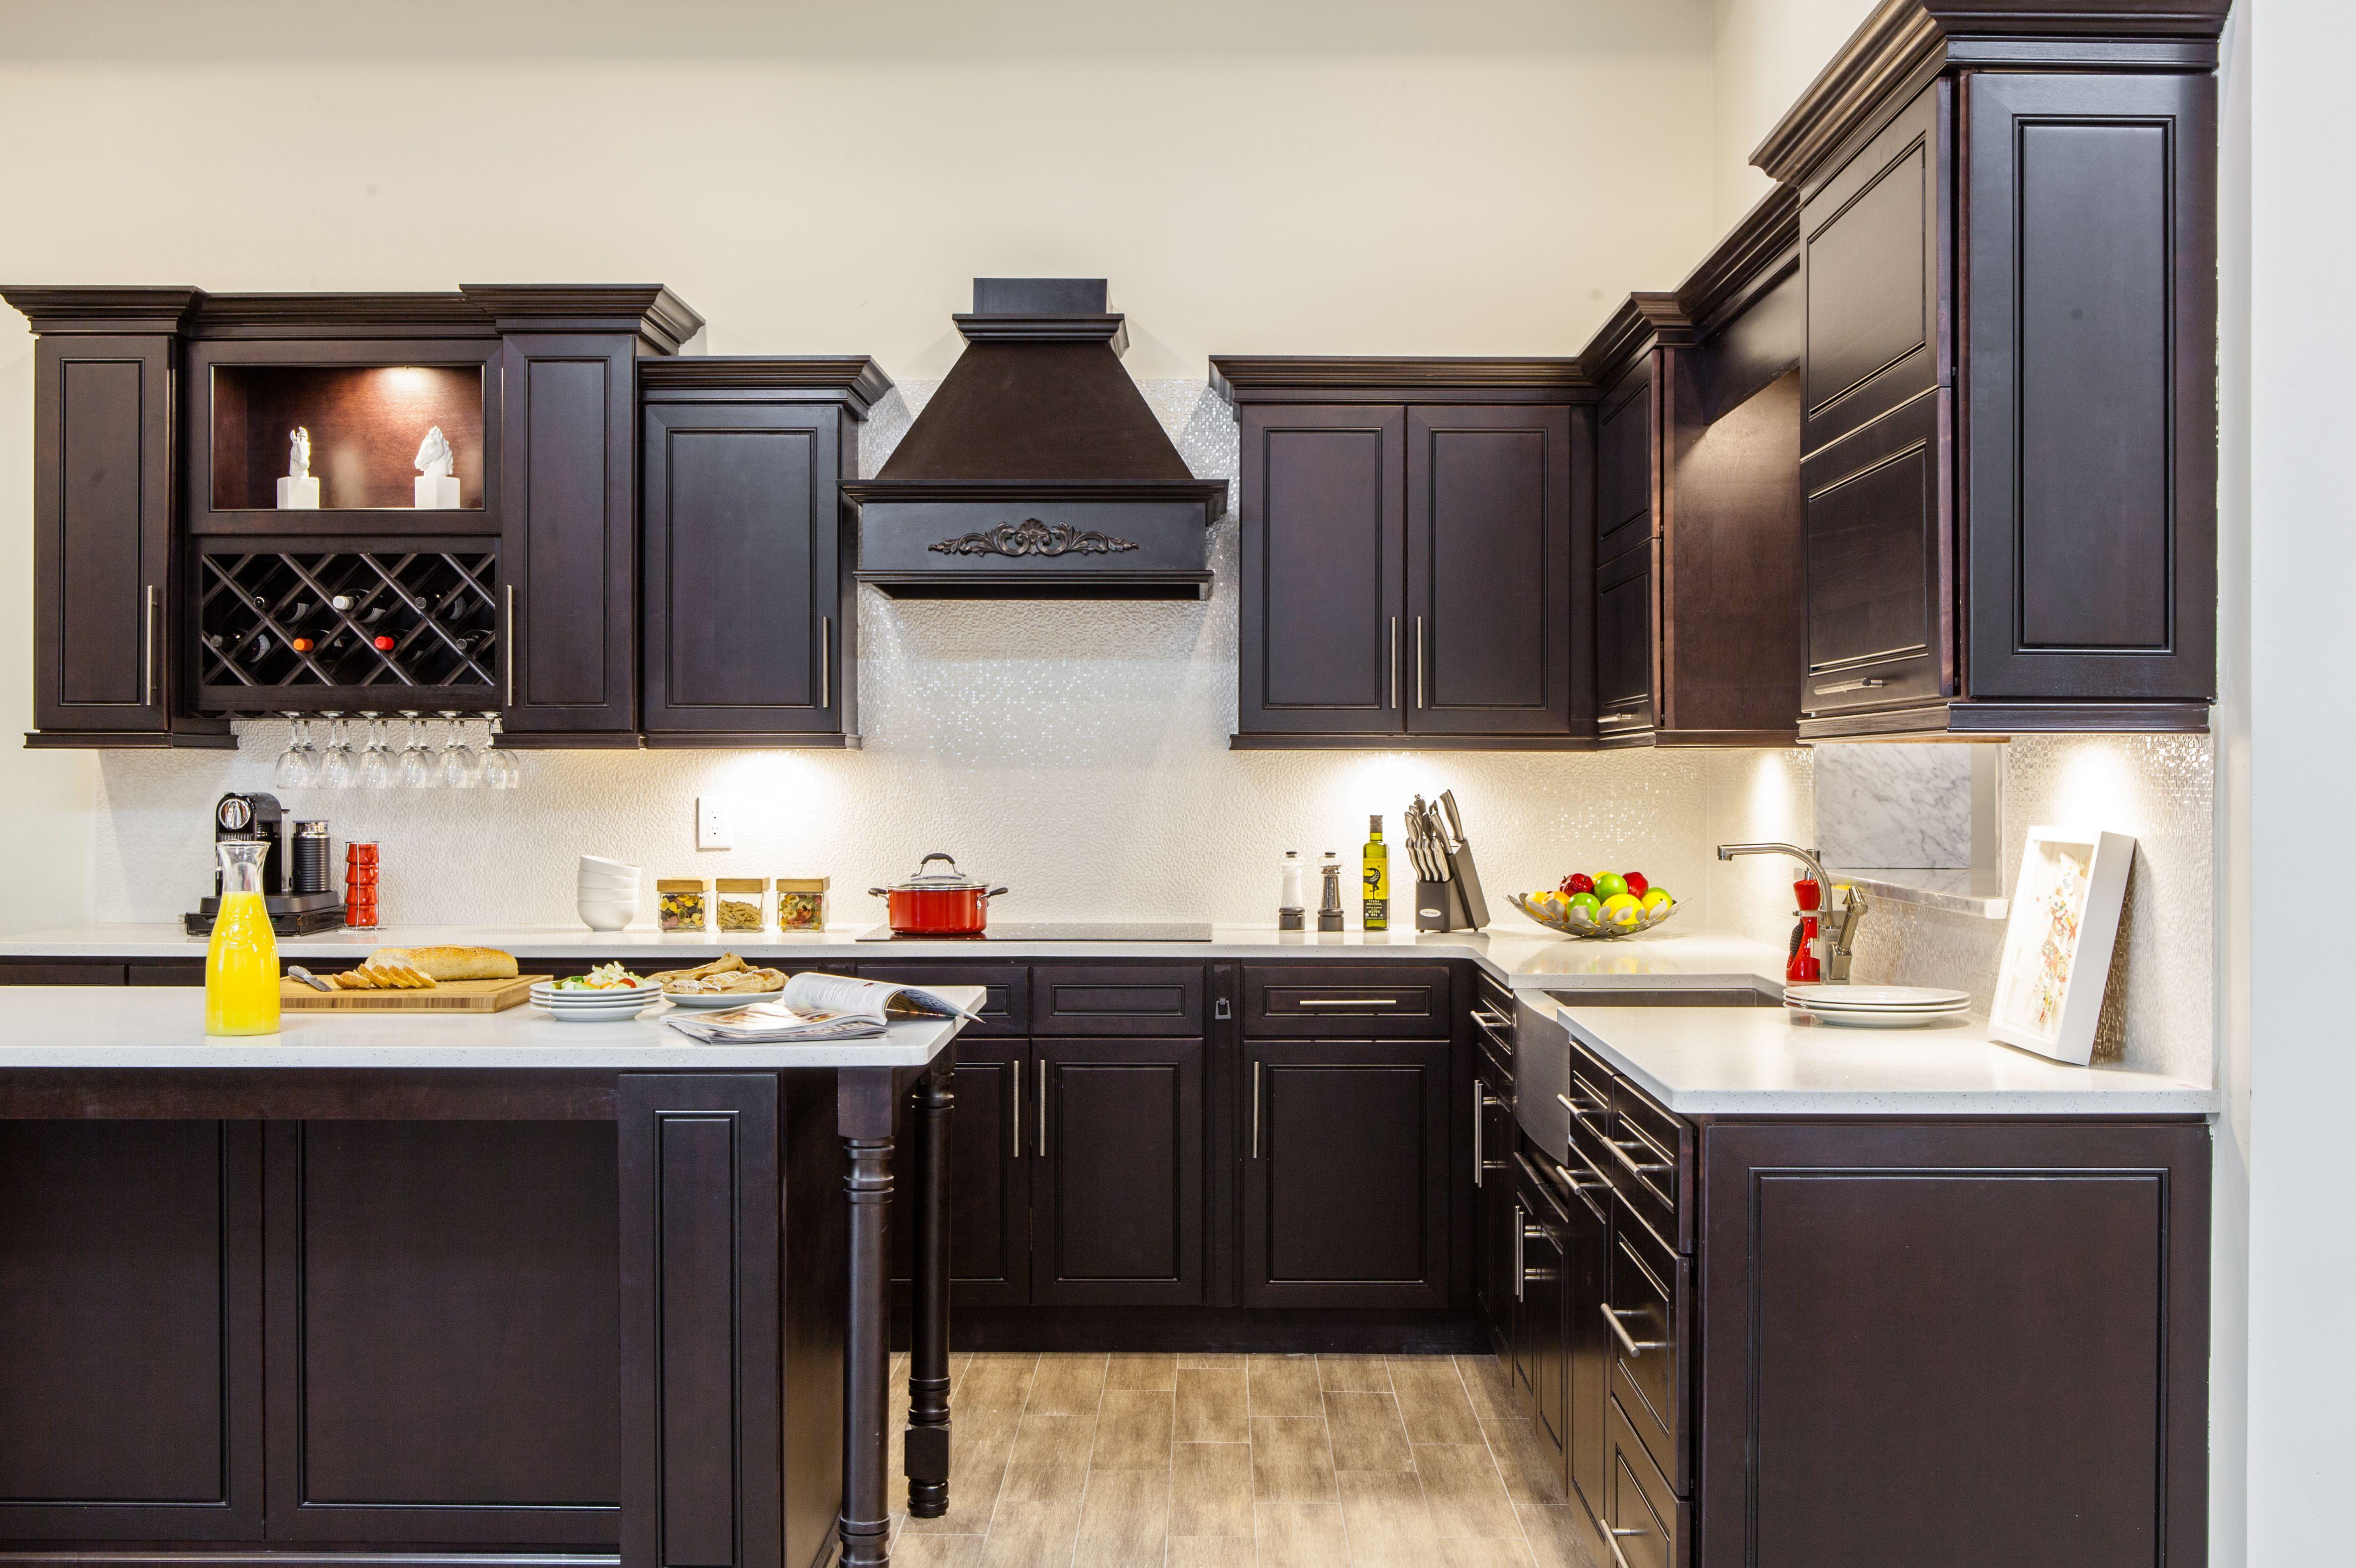 Best J K Espresso Maple Vanity Style K8 Small Kitchen Design 400 x 300